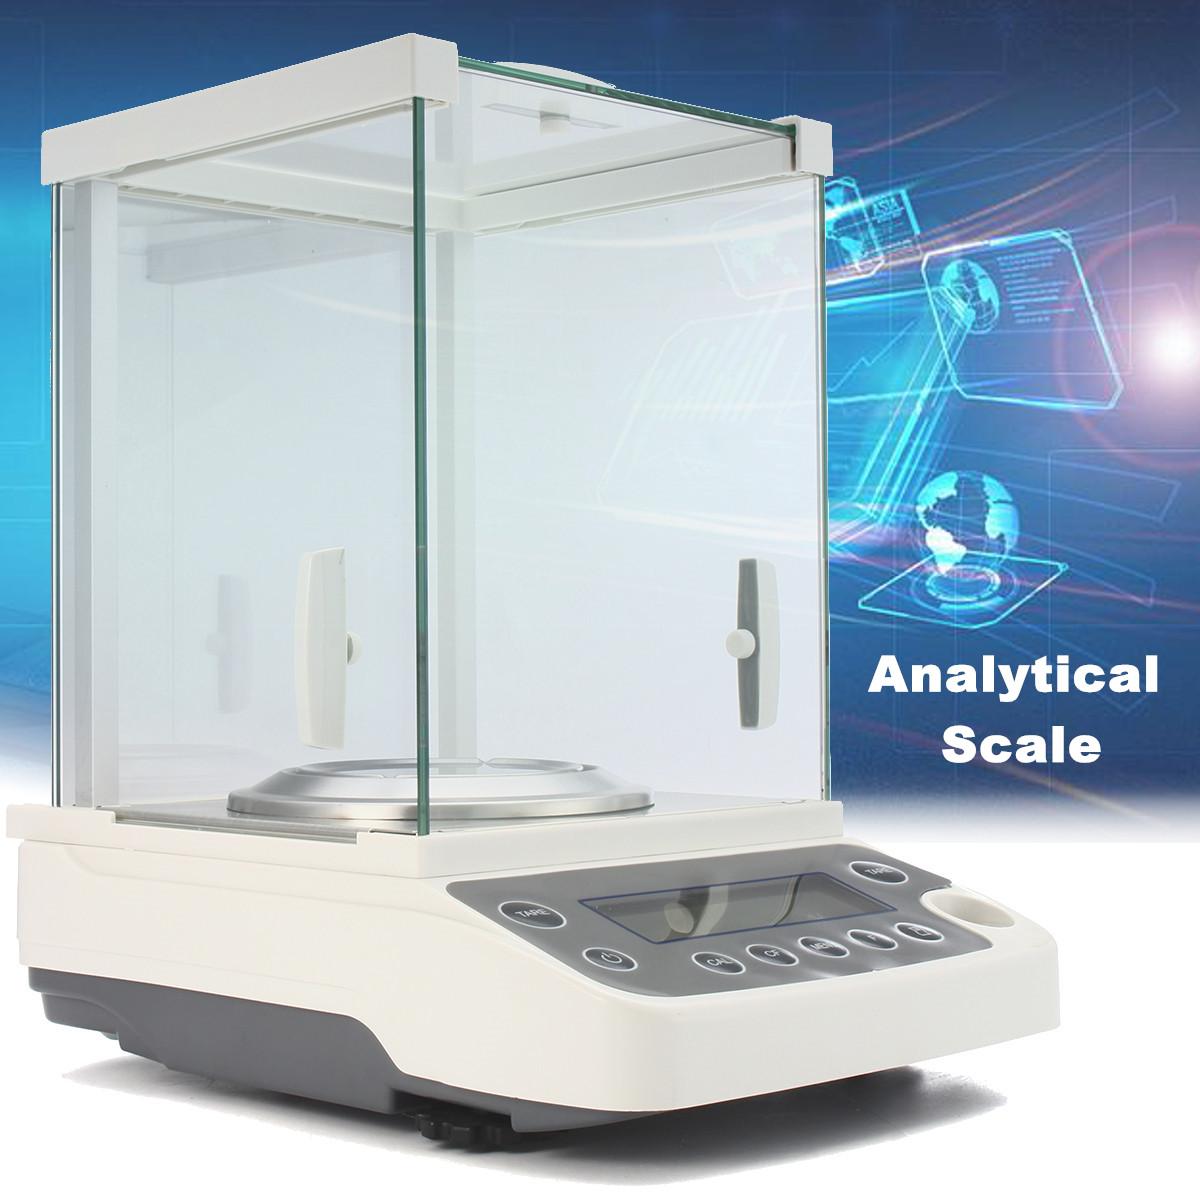 120g/0.0001g Balance analytique LCD de laboratoire Balance de précision numérique 0.1mg Balance analytique de laboratoire de haute précision 100-240V